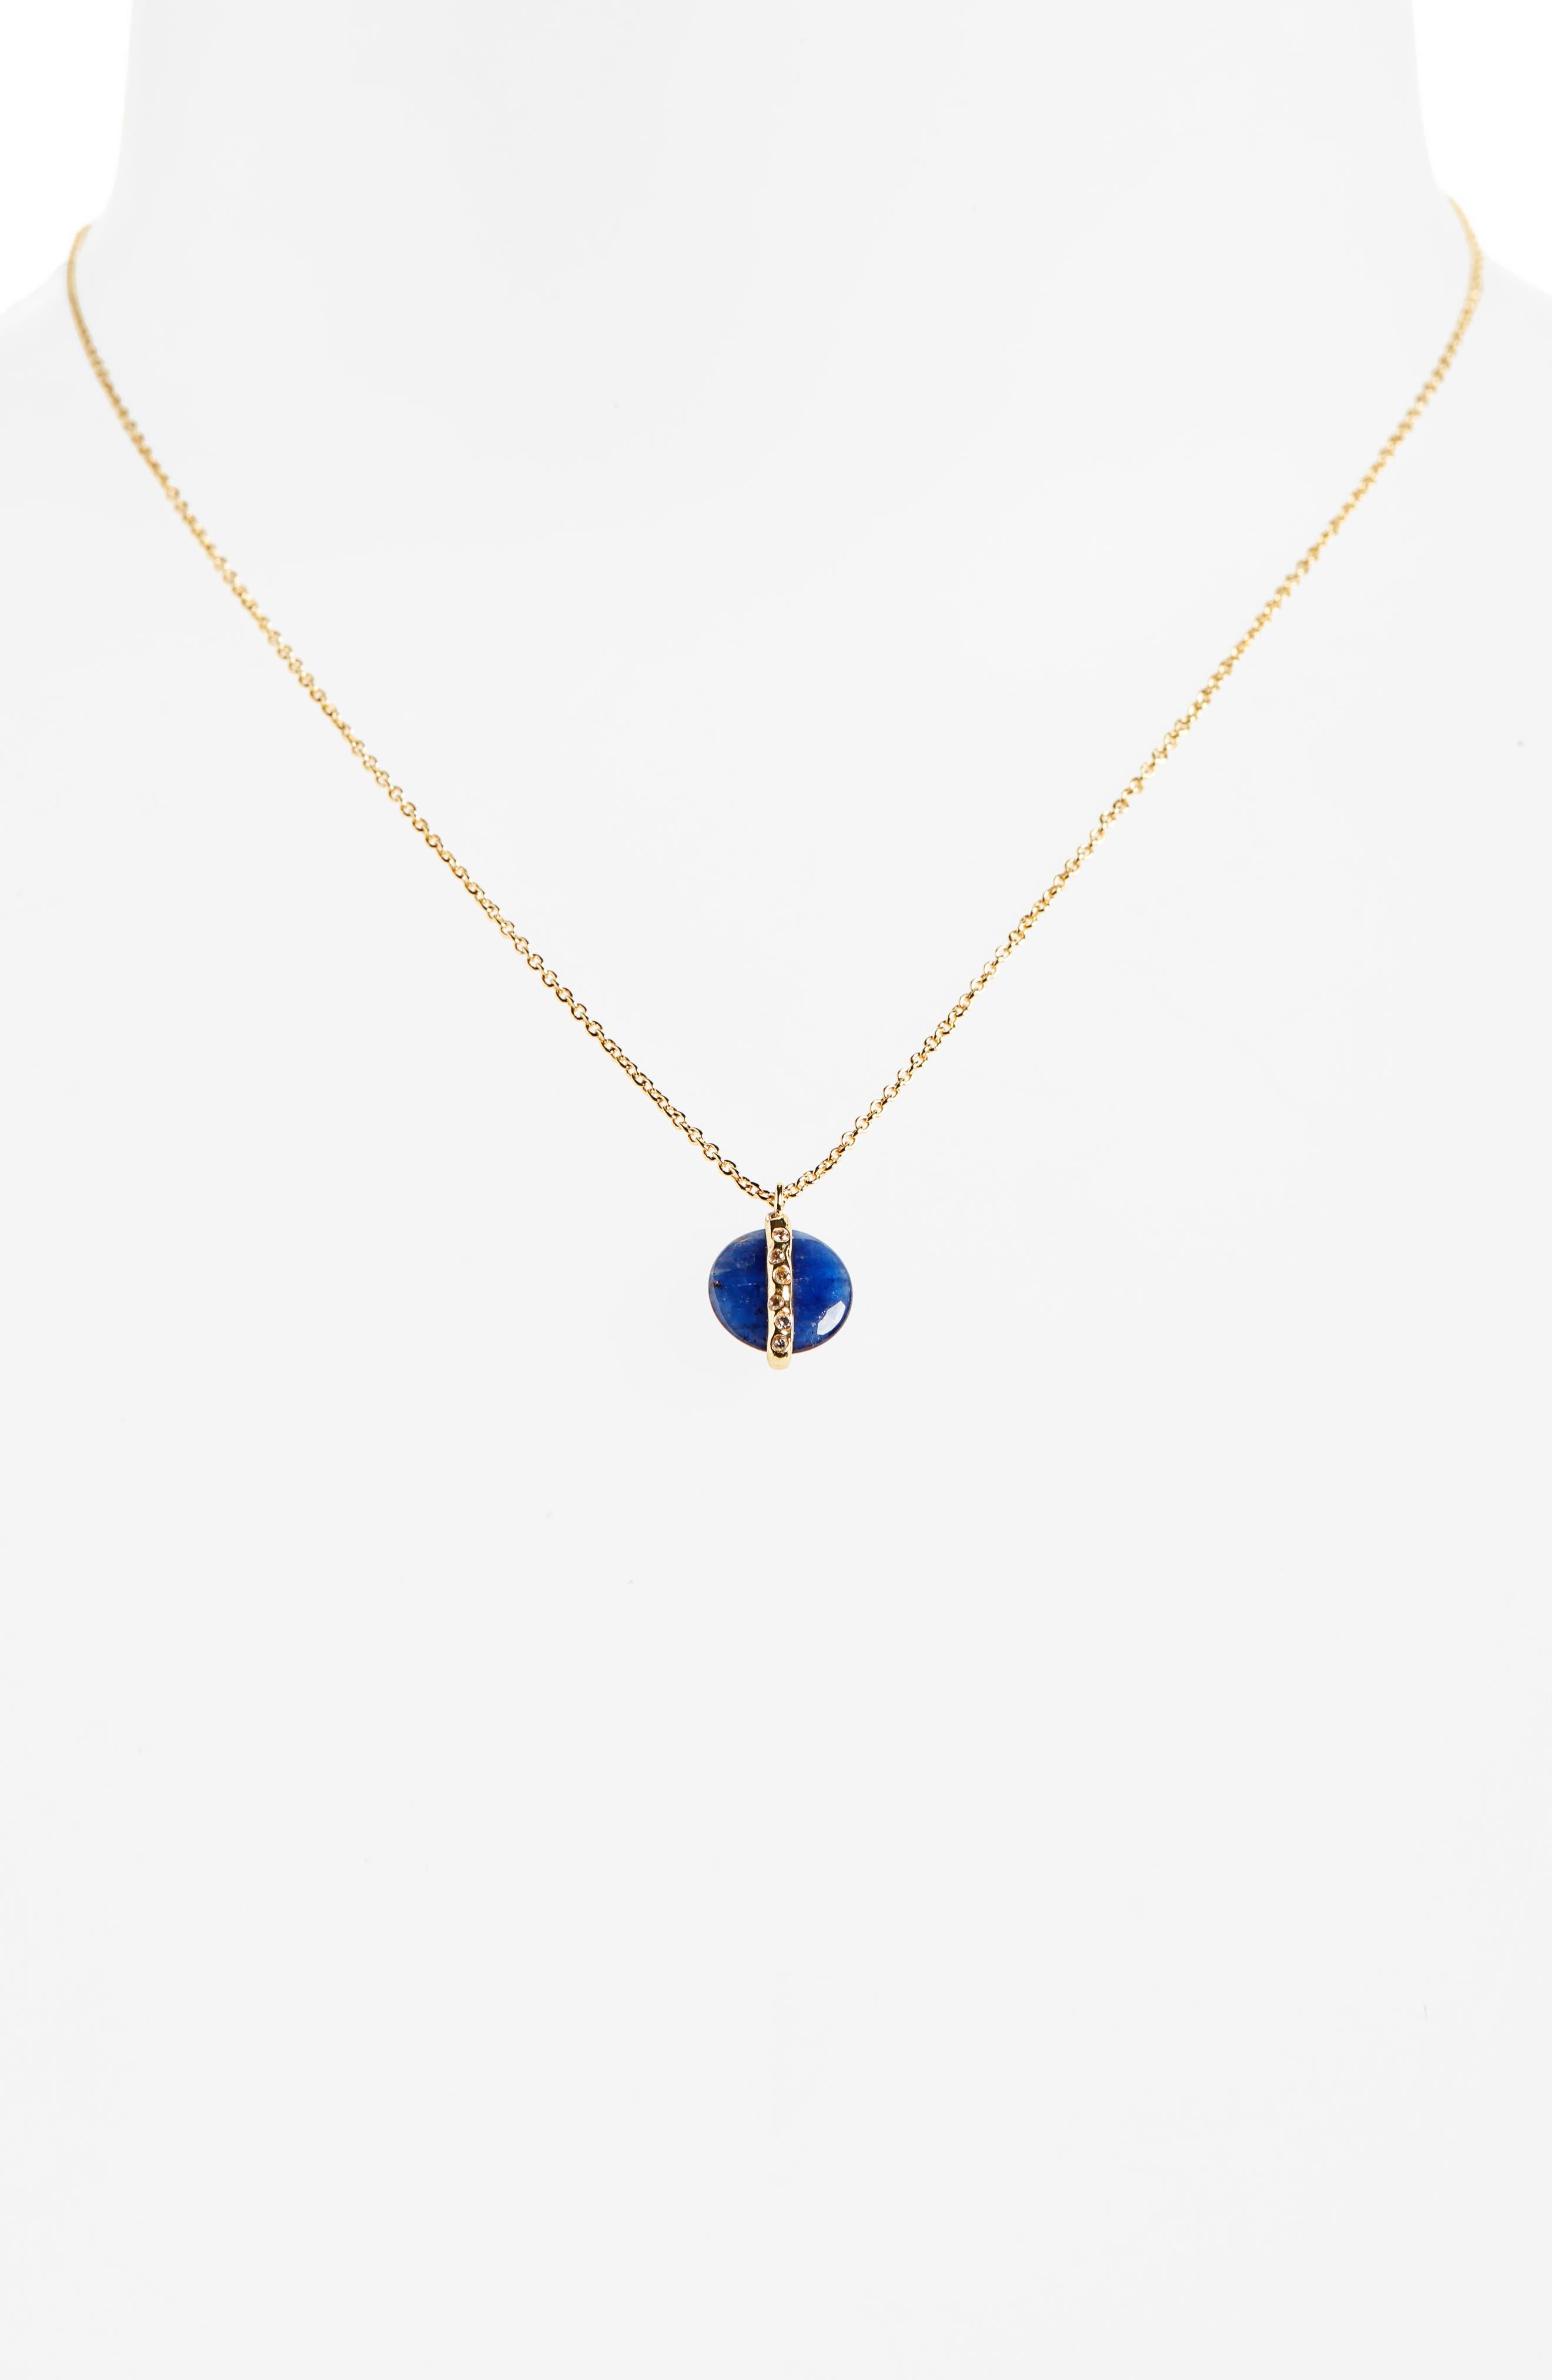 Brinn Shimmer Pendant Necklace,                         Main,                         color, SODALITE/ GOLD